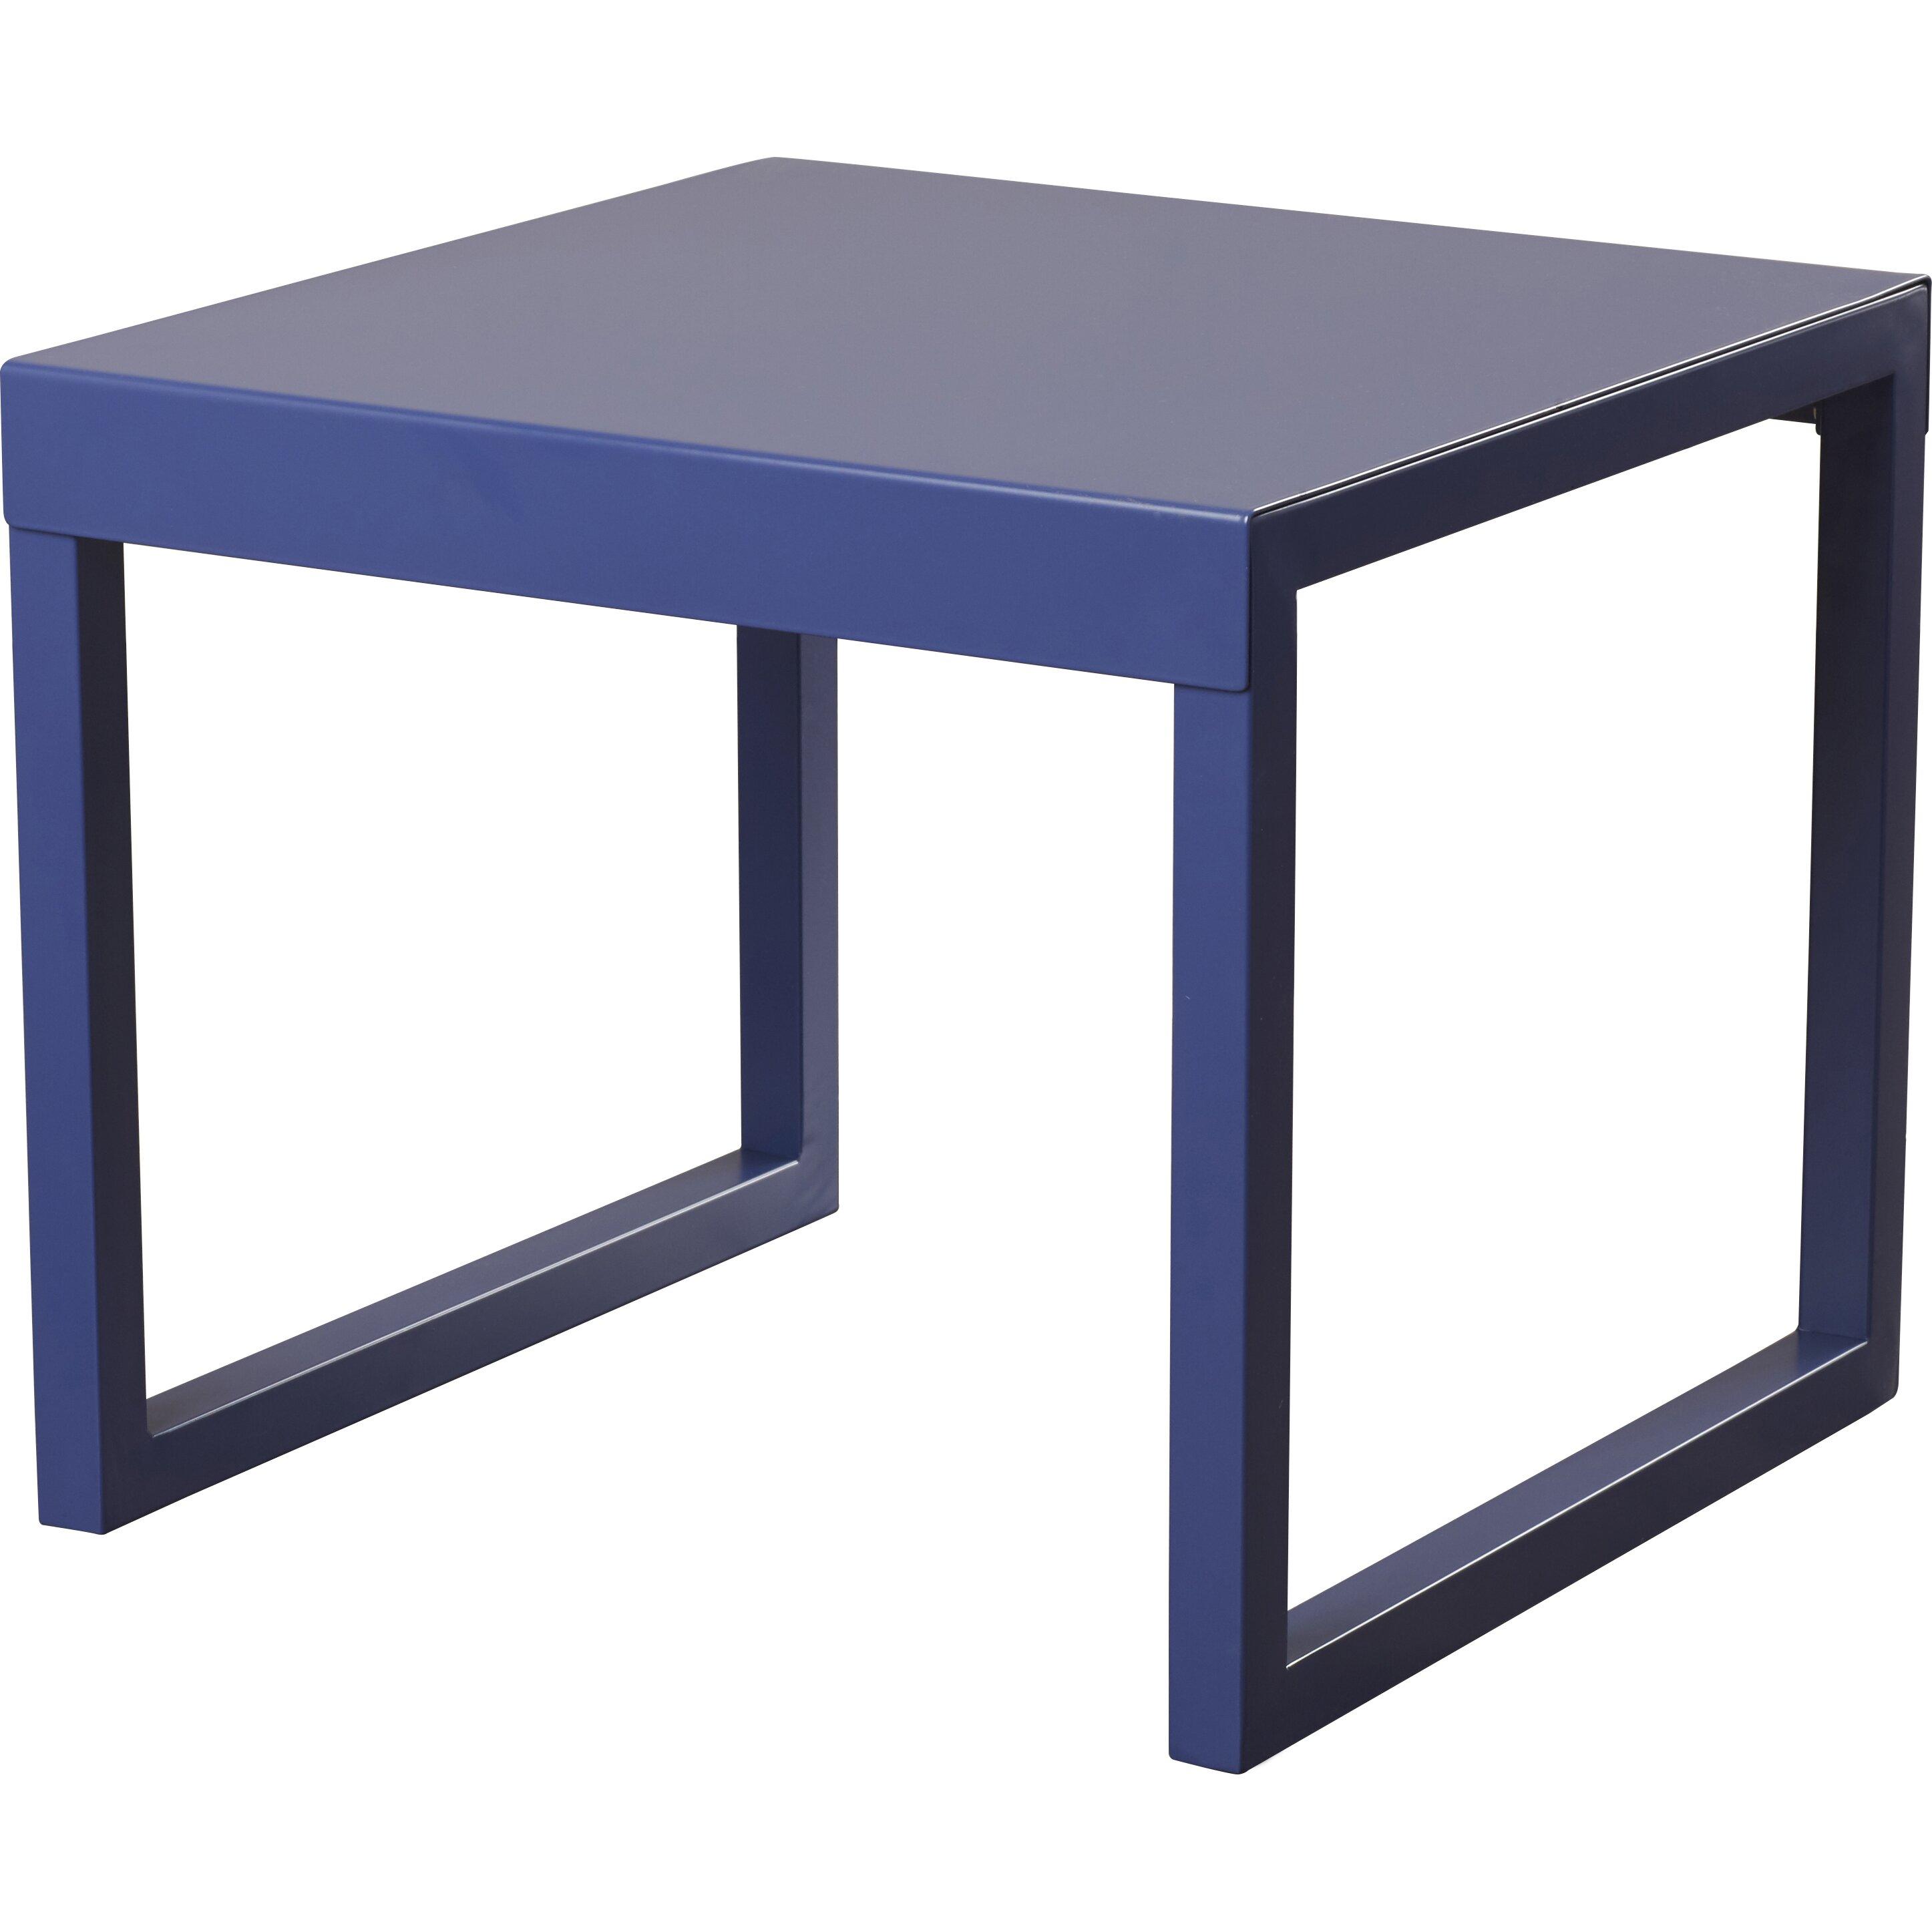 Zipcode Design Wilhelmina End Table amp Reviews Wayfair : Zipcode25E2258425A2 Design Wilhelmina End Table from www.wayfair.com size 2893 x 2893 jpeg 386kB